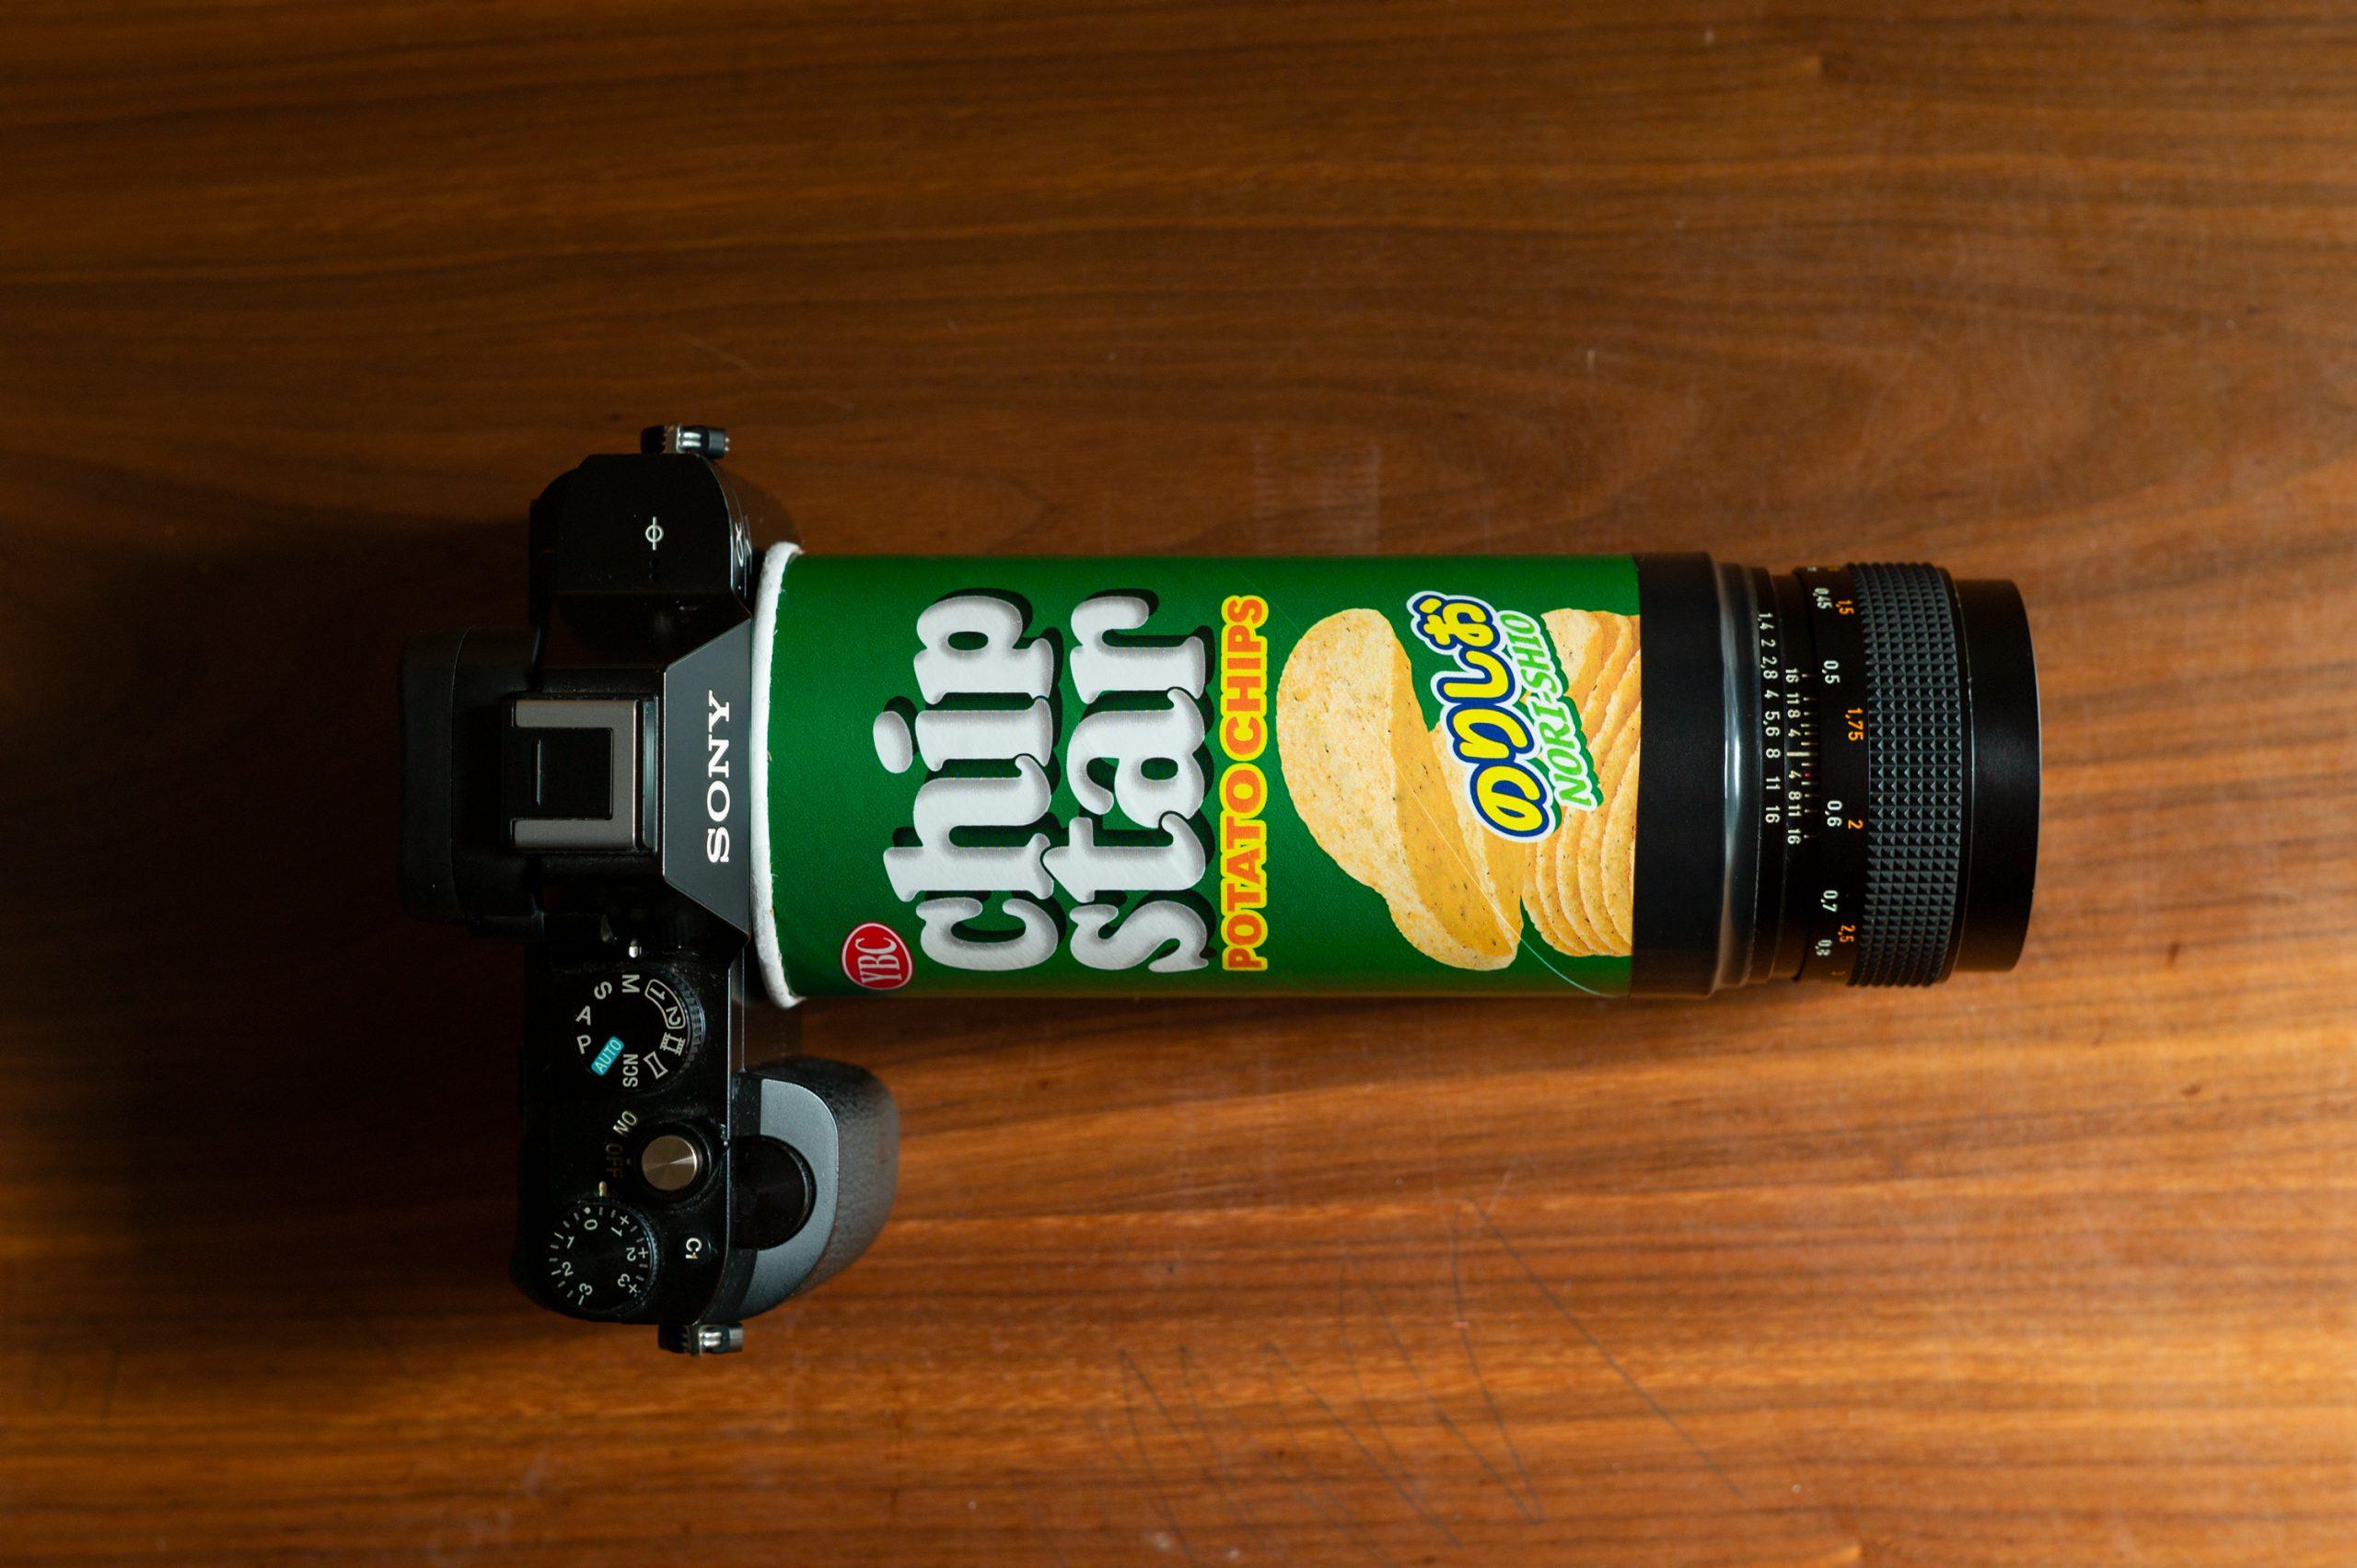 【CONTAX】Super Macro Chip Star 50mm F1.4 AE (のりしお味)